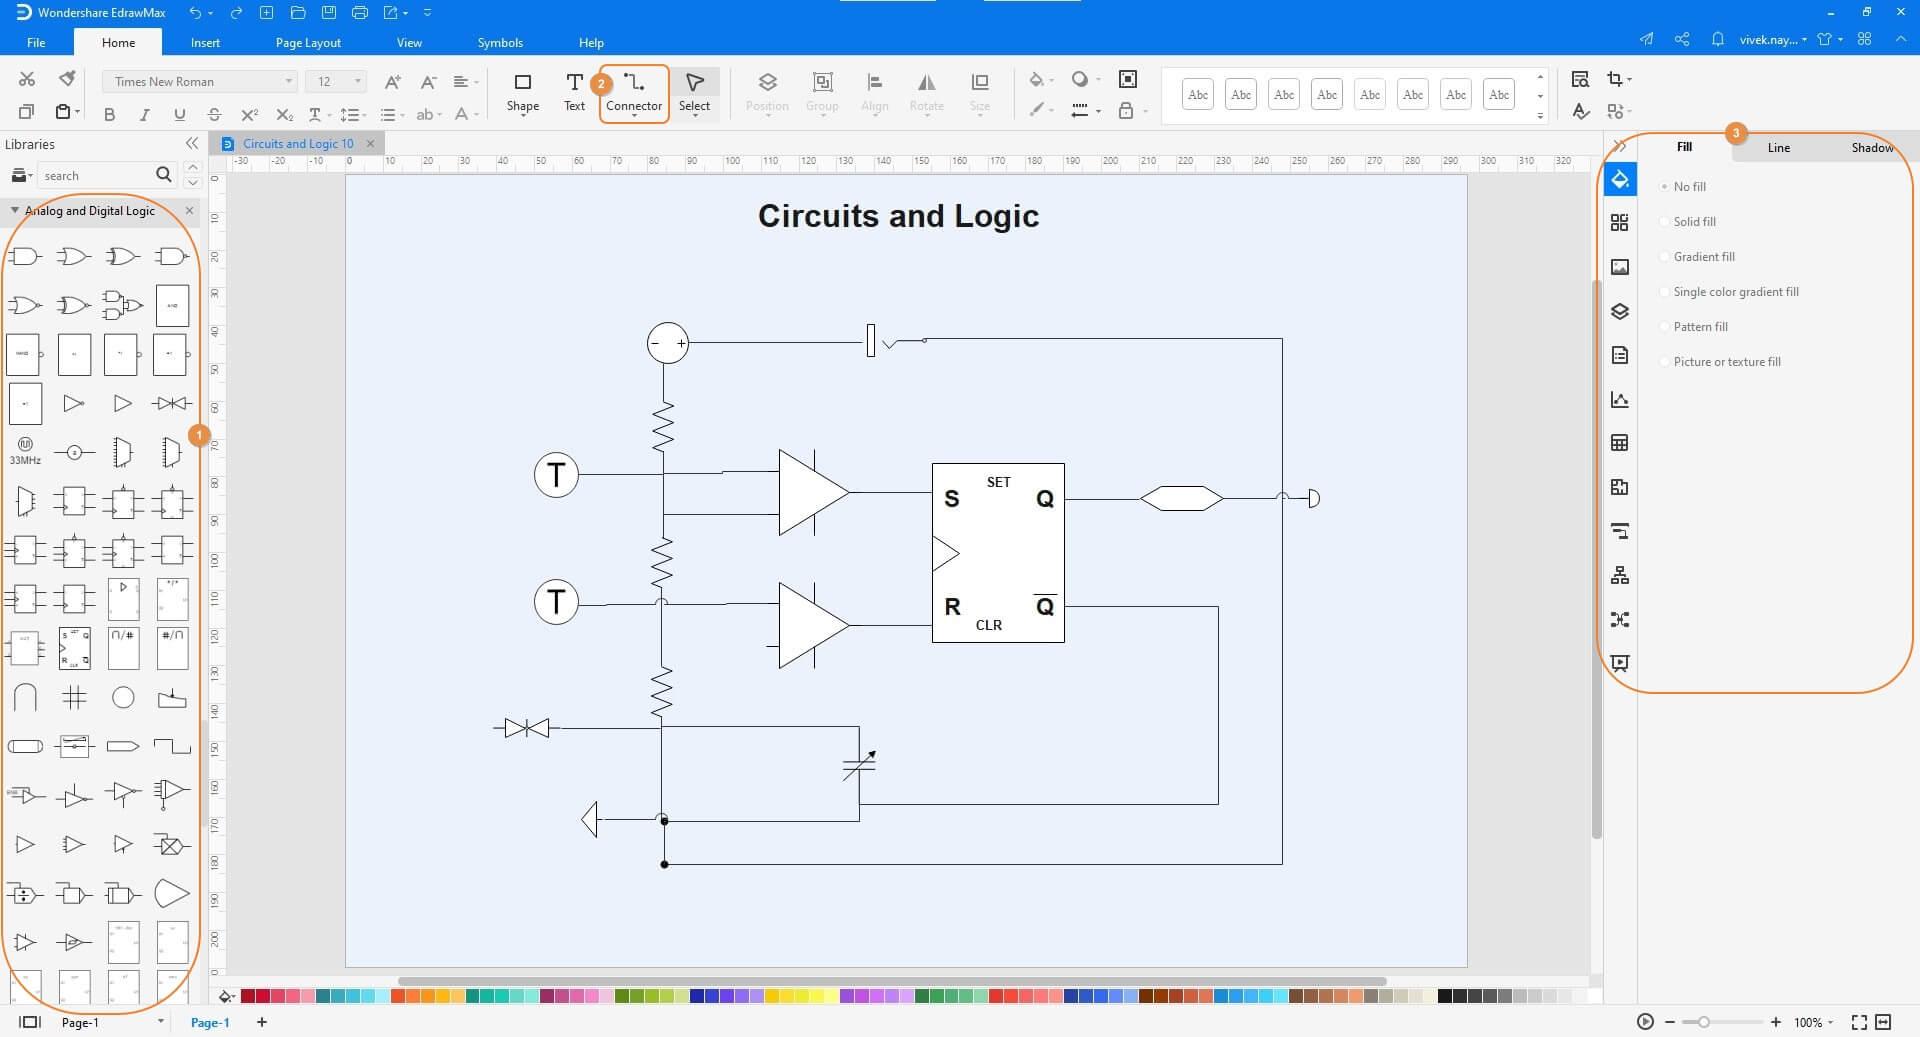 Modify the Circuit